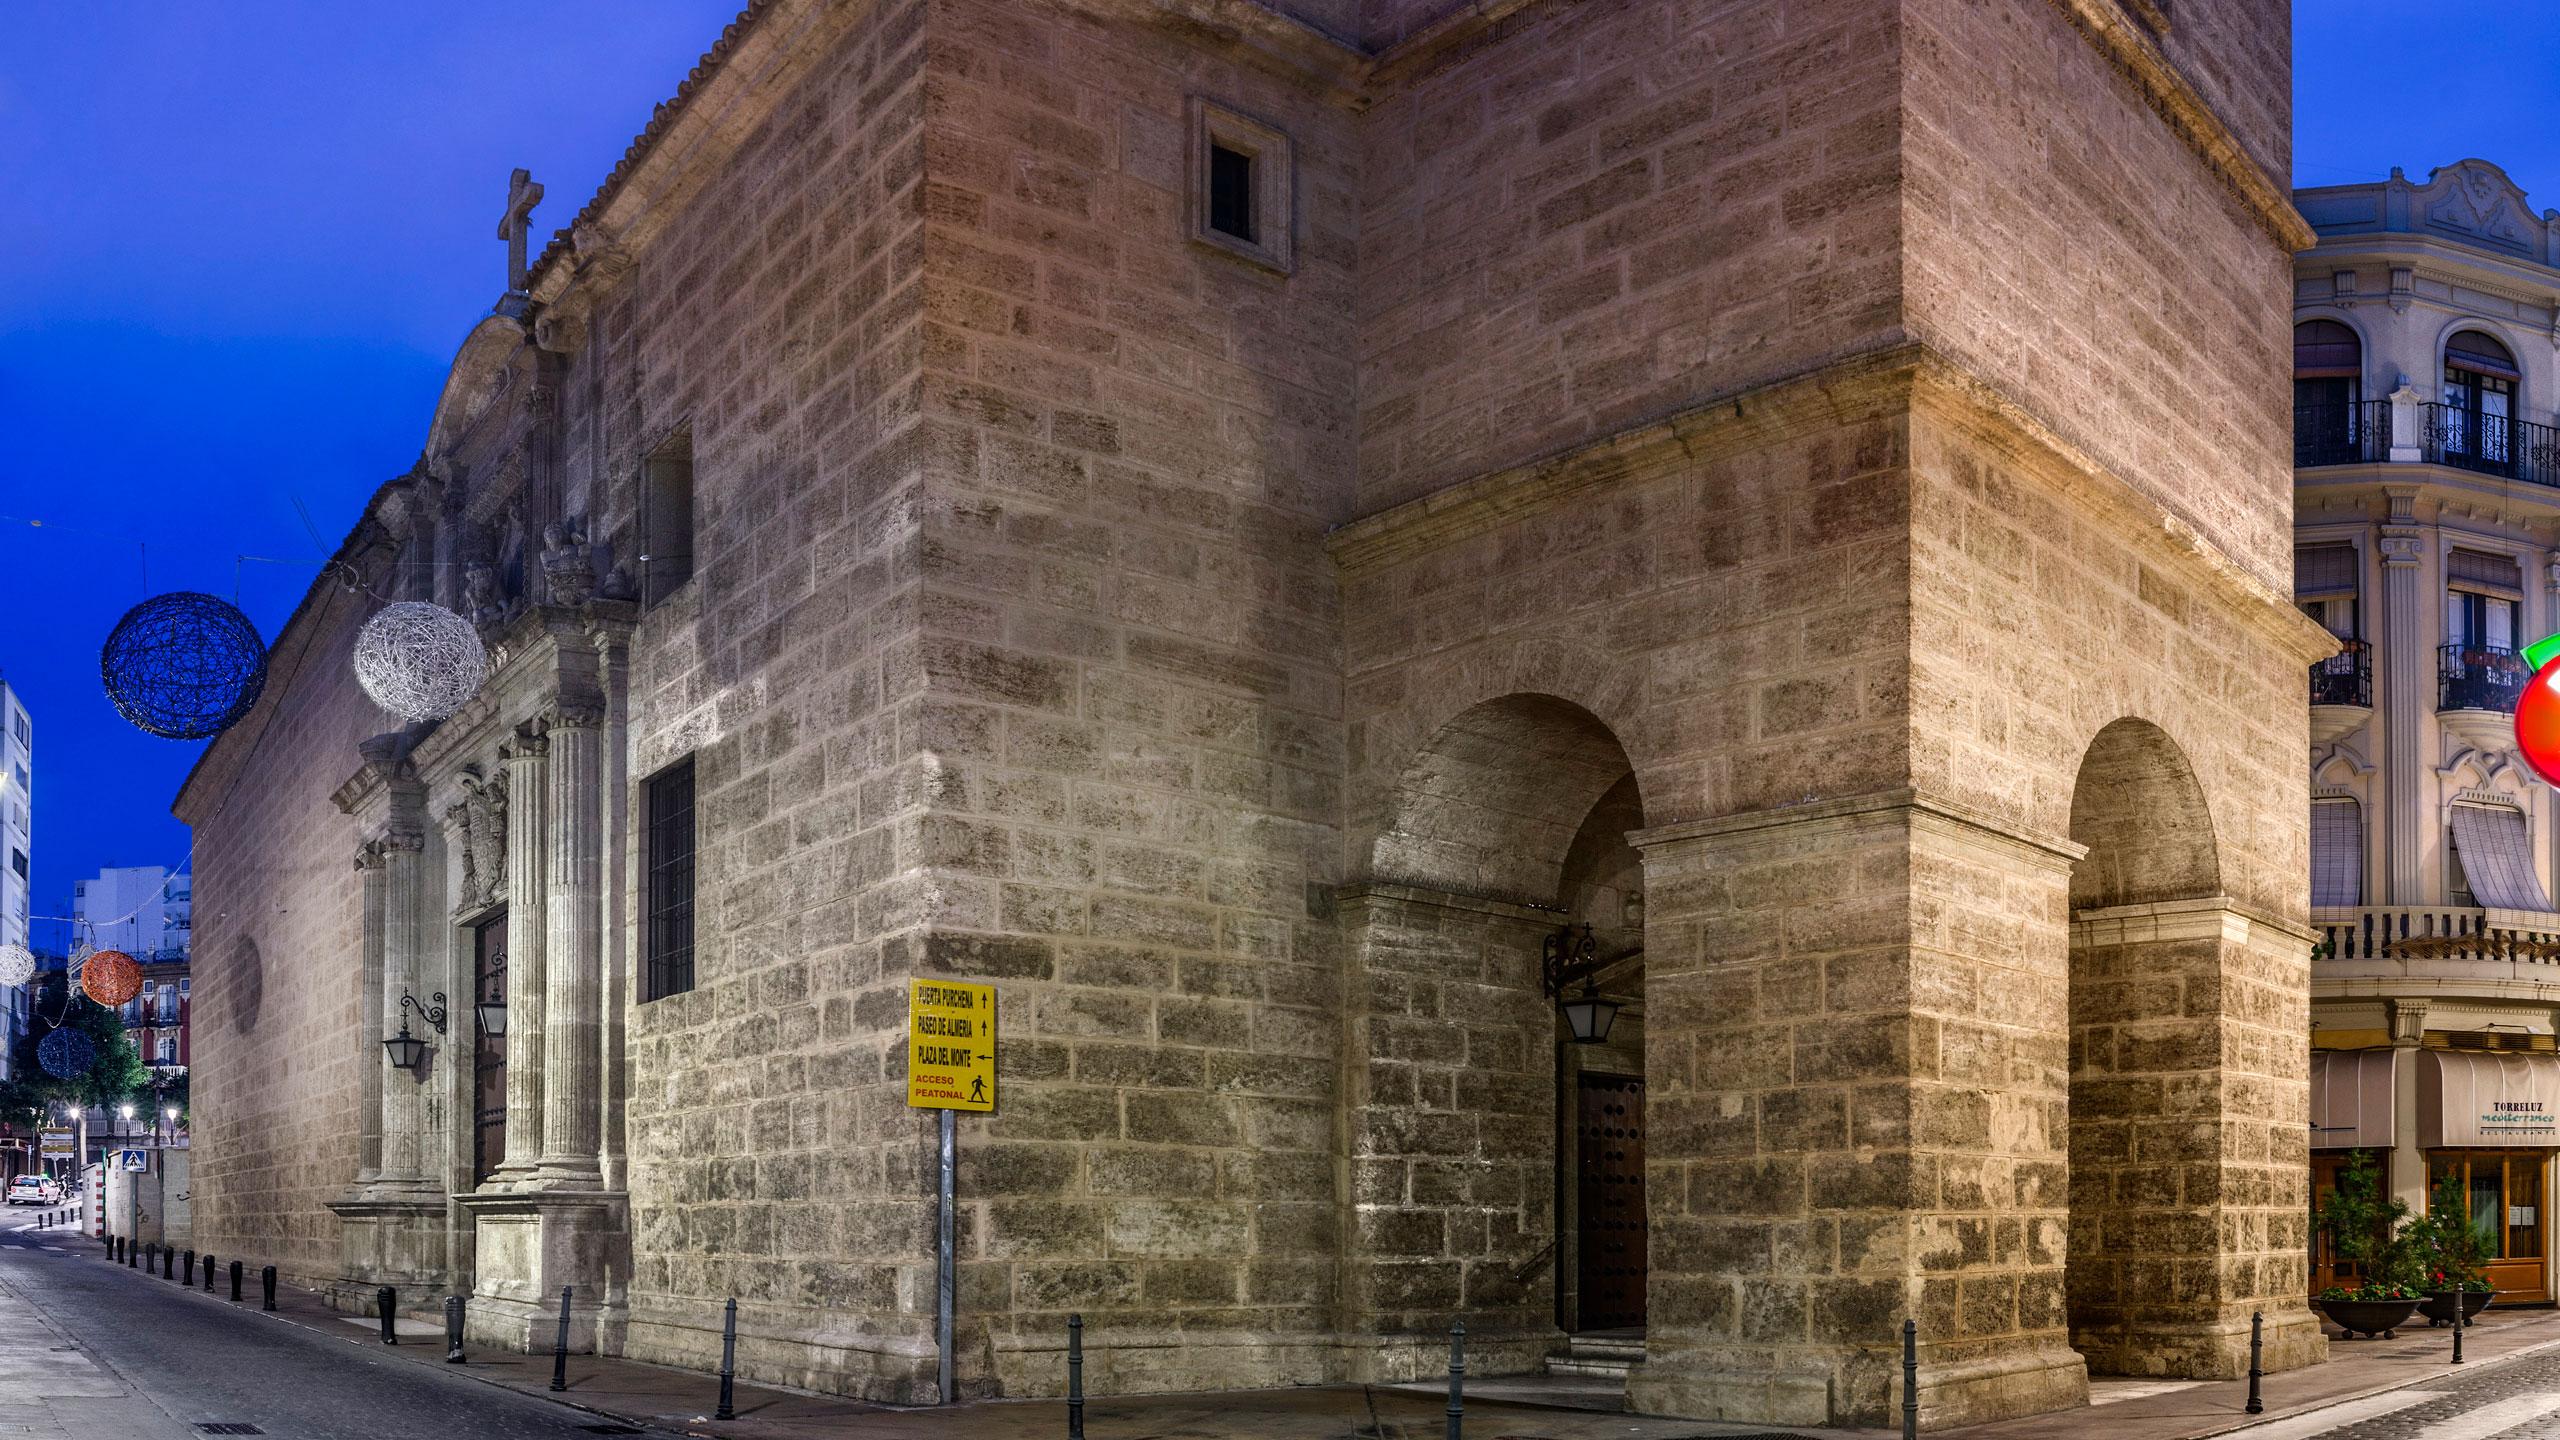 iglesia de santiago almeria